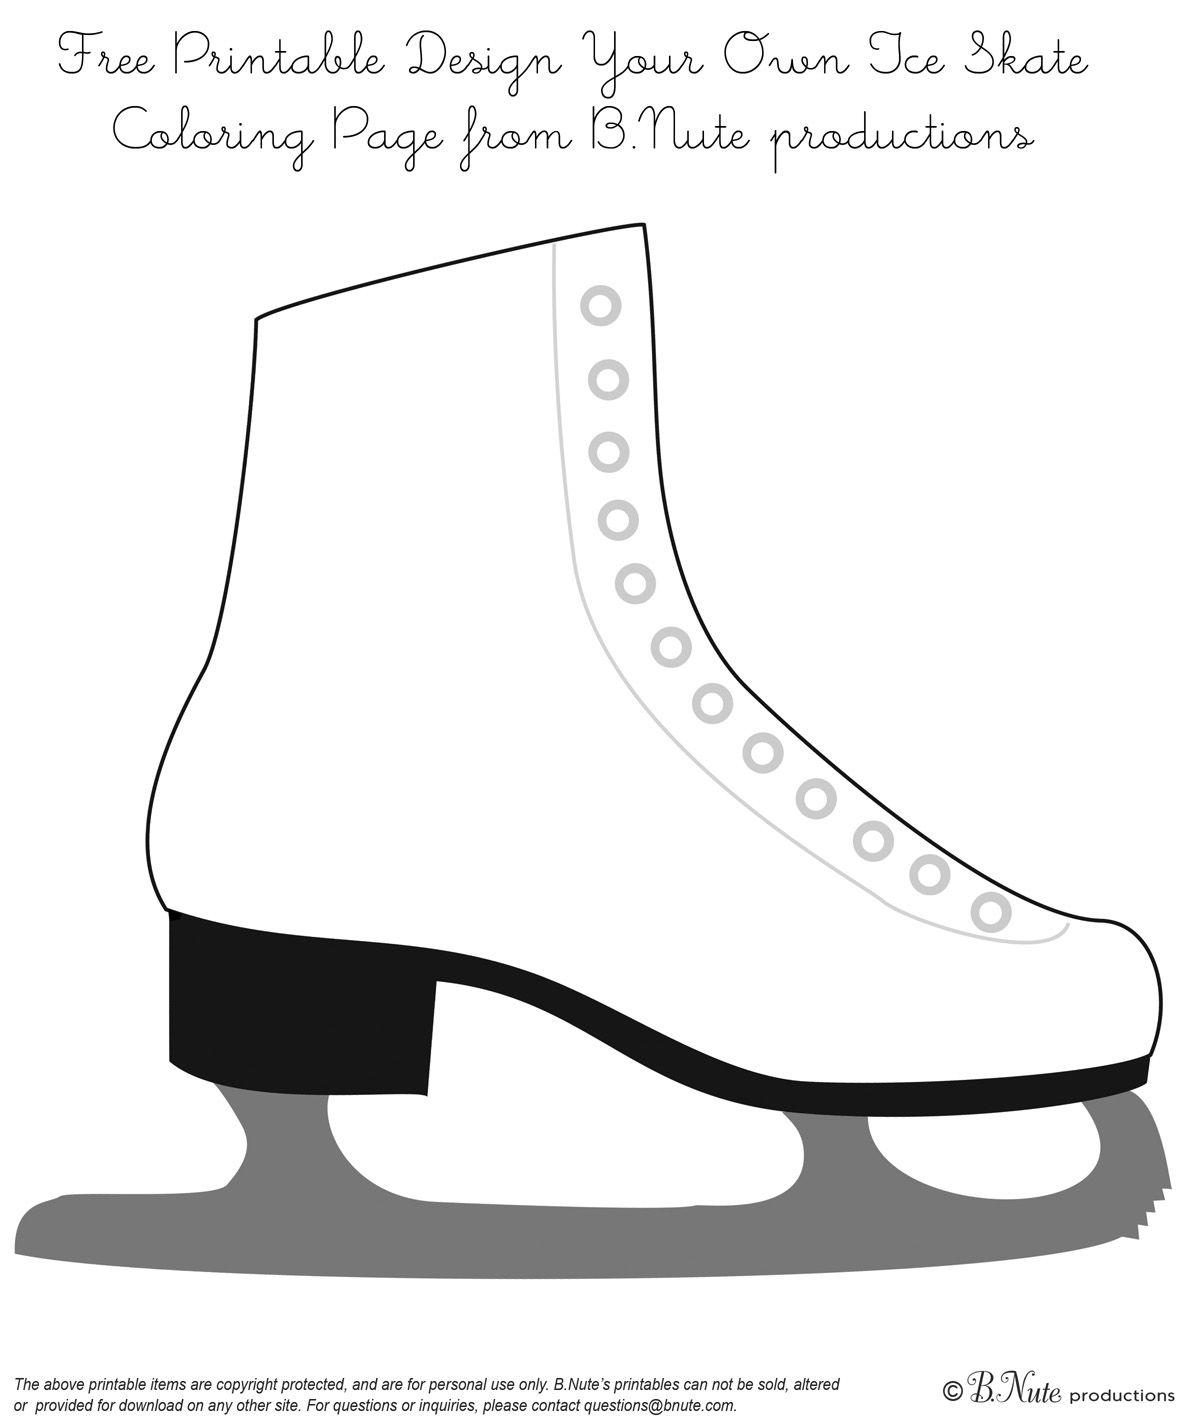 Bnute productions November 2012 Ice skating Ice